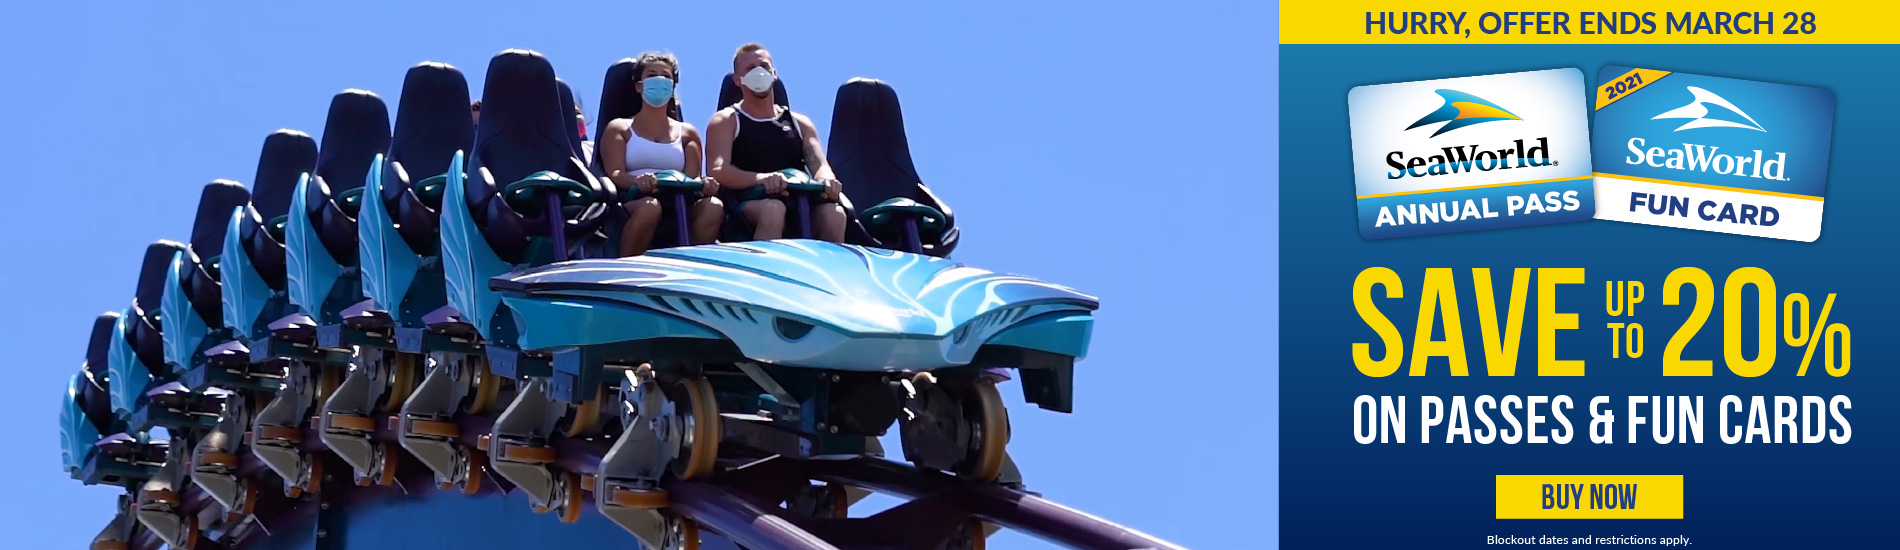 SeaWorld Orlando Save 20% on Passes and Fun Cards